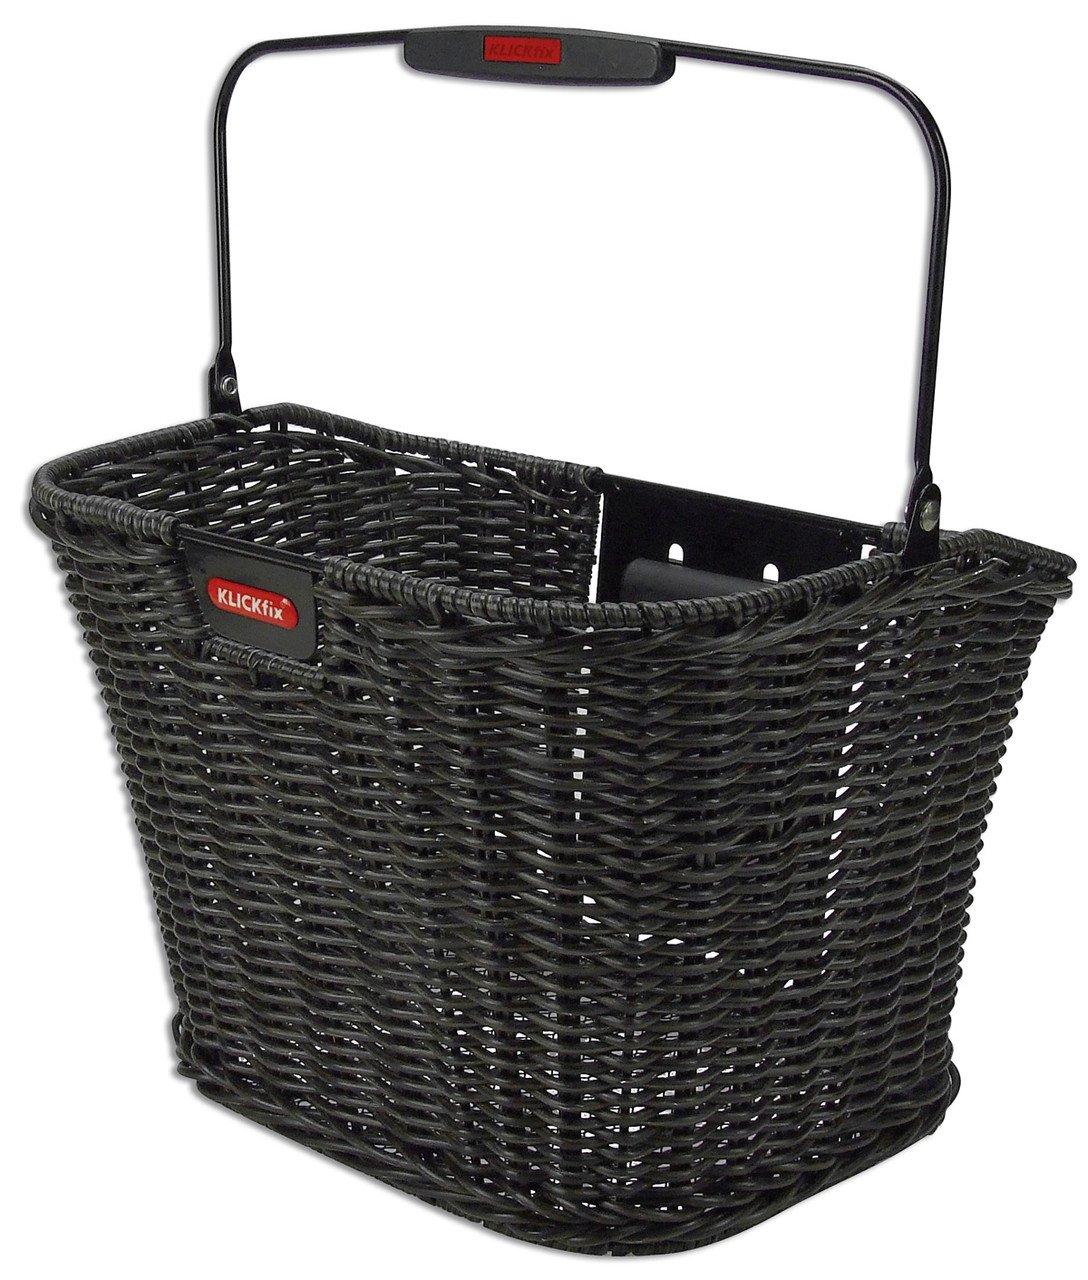 KlickFix Structura Retro Front Handlebar Basket black